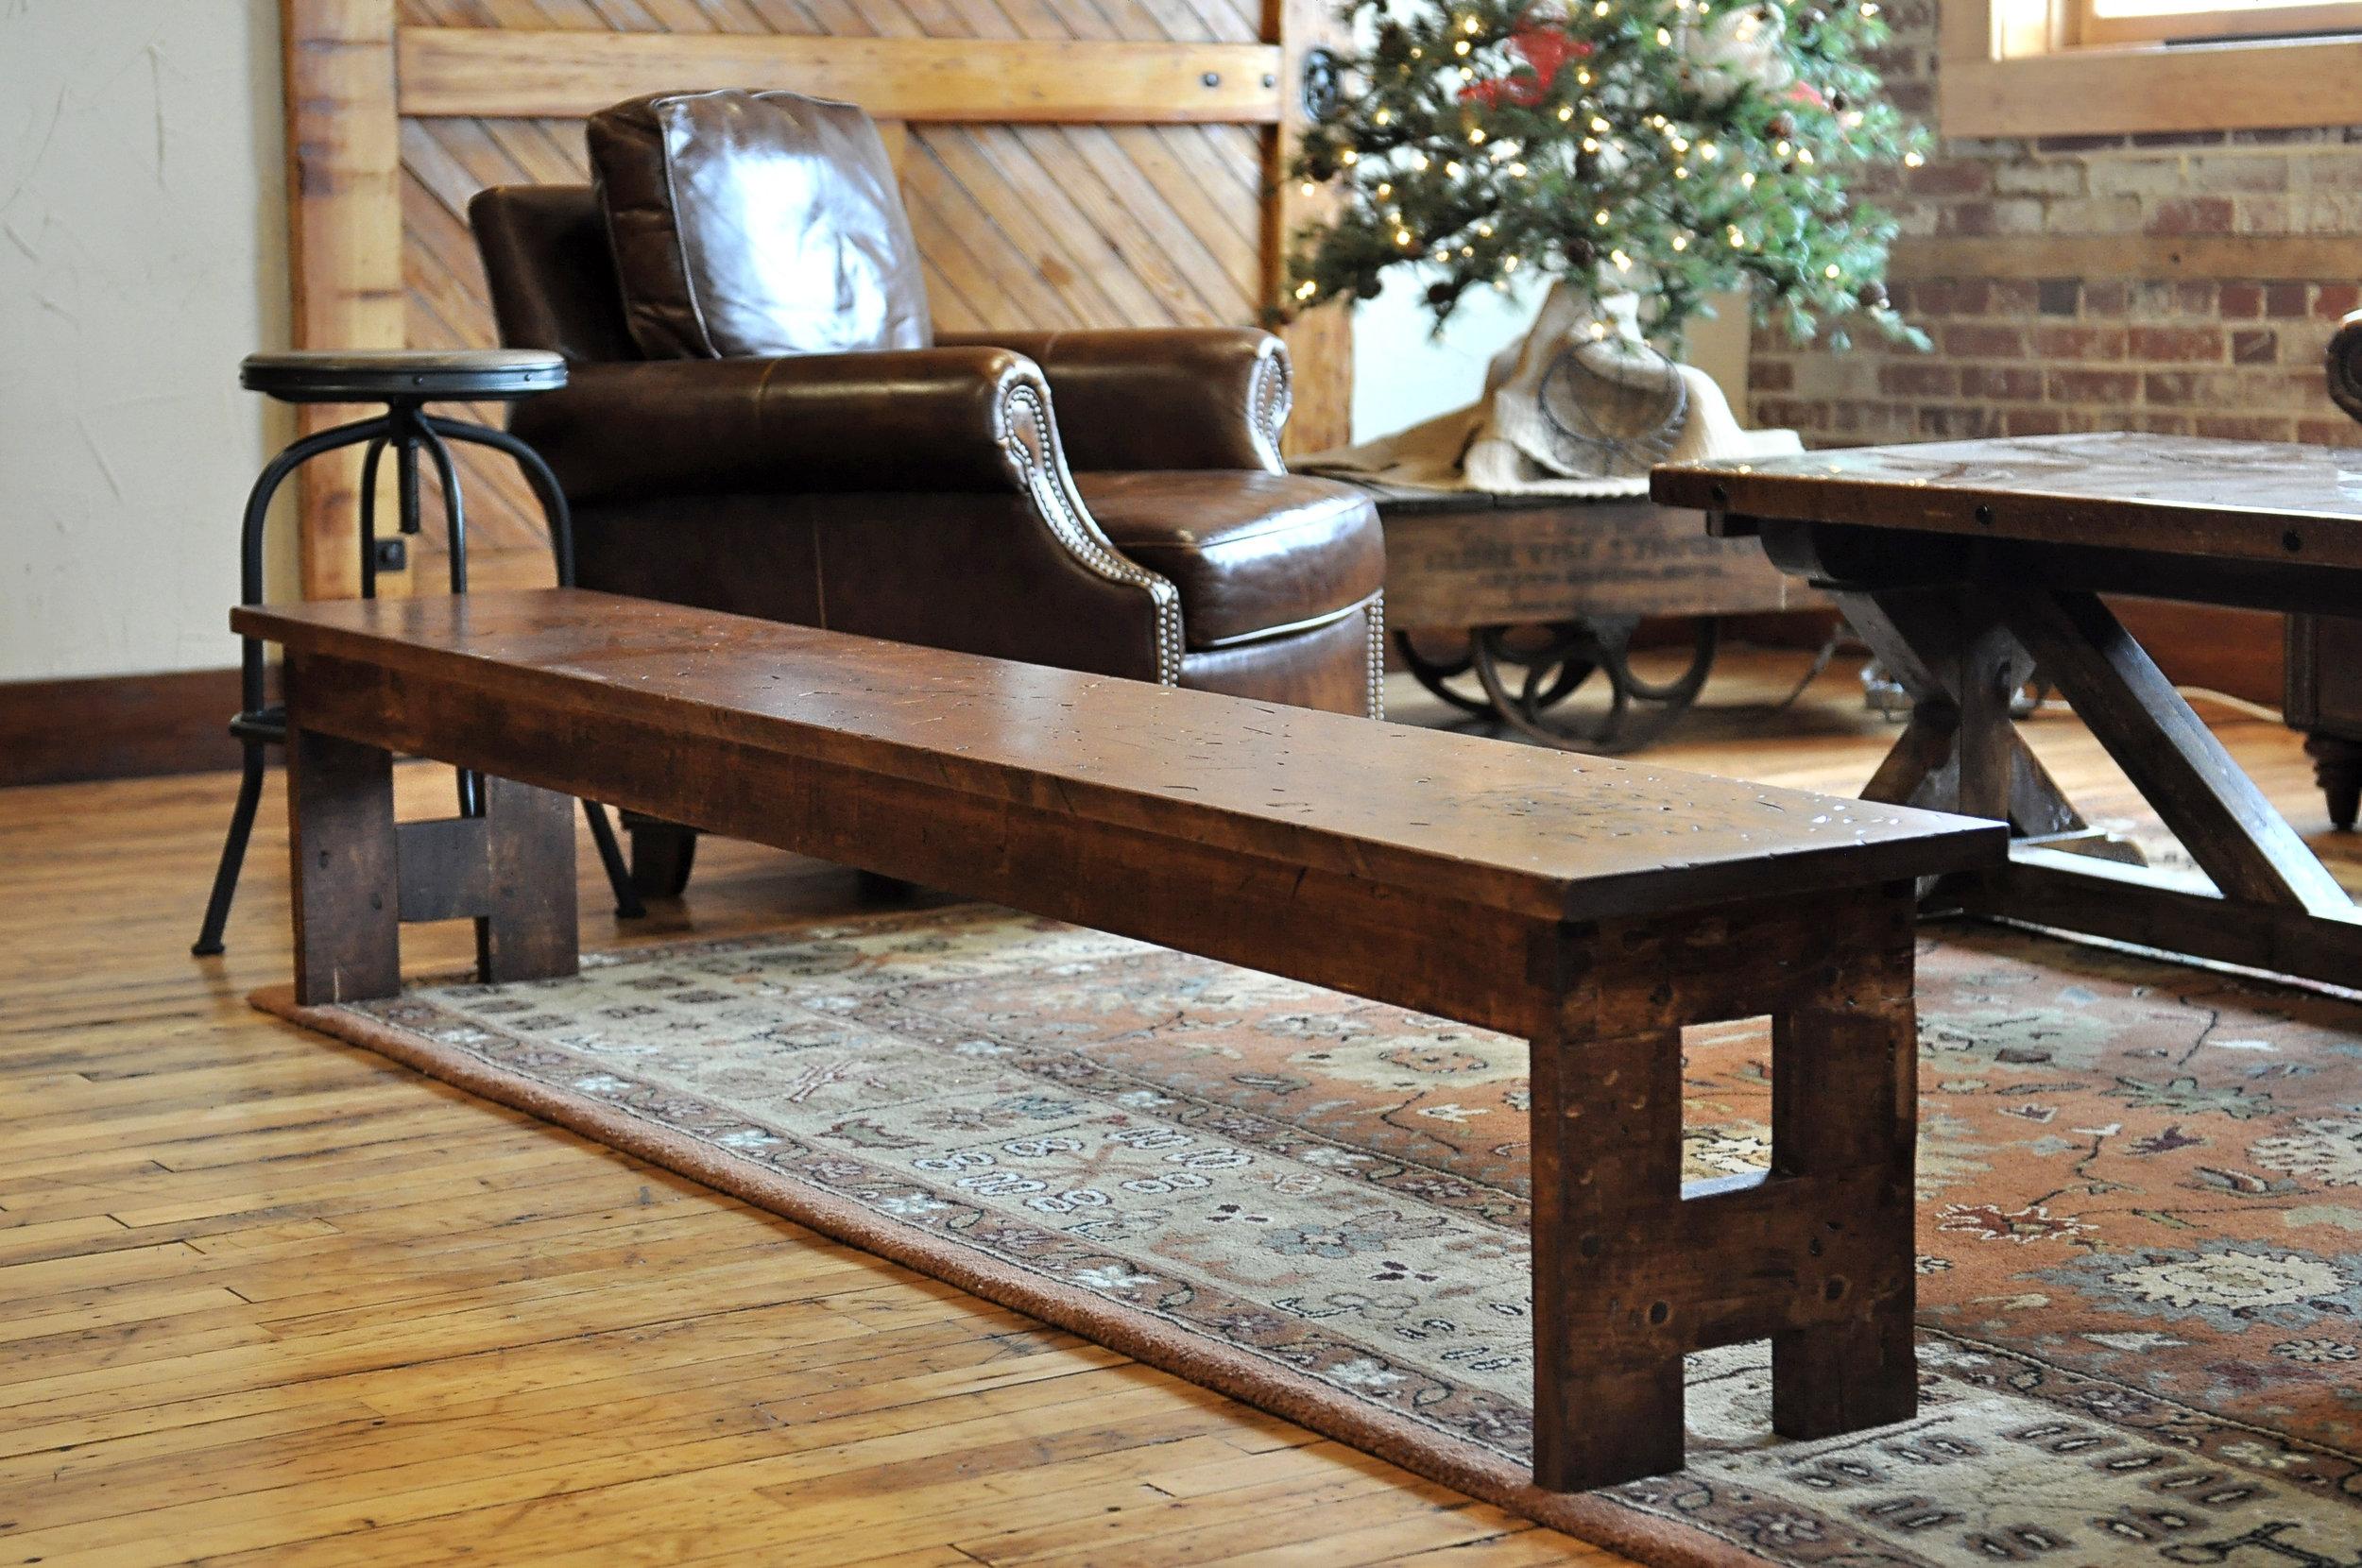 bespoke furniture, custom handmade bench